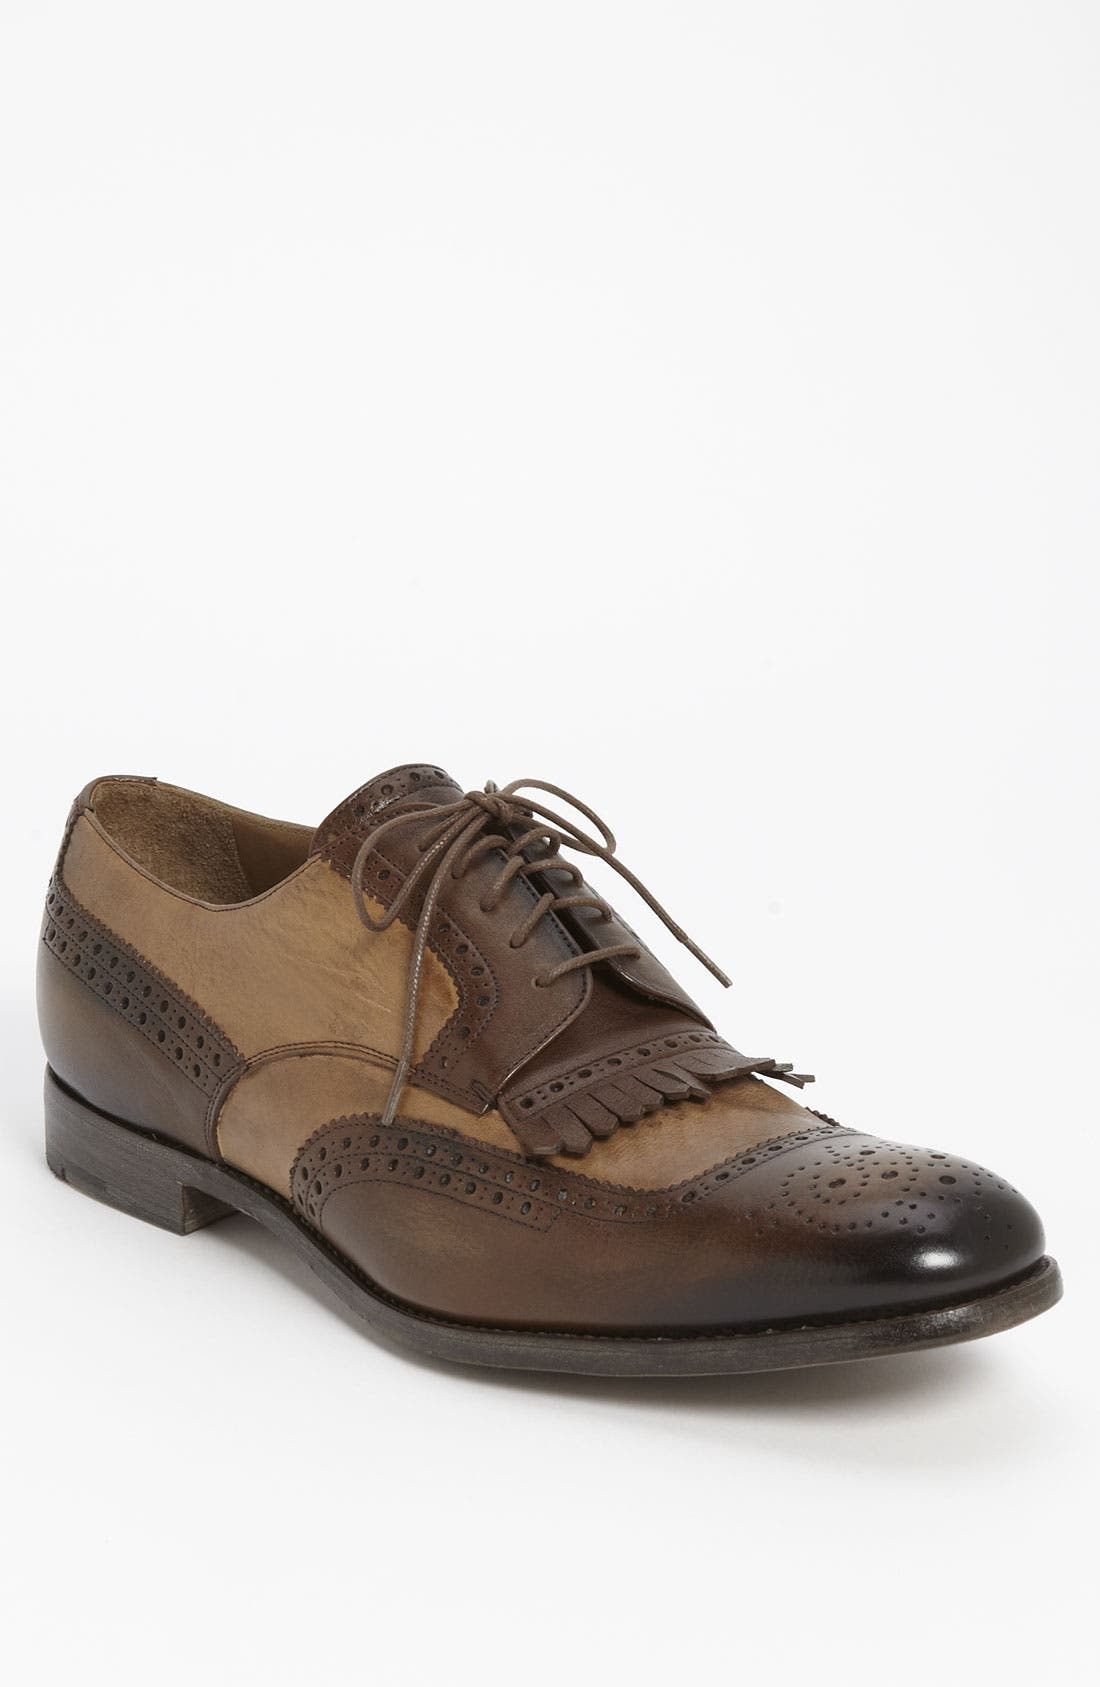 Alternate Image 1 Selected - Prada Kiltie Spectator Shoe